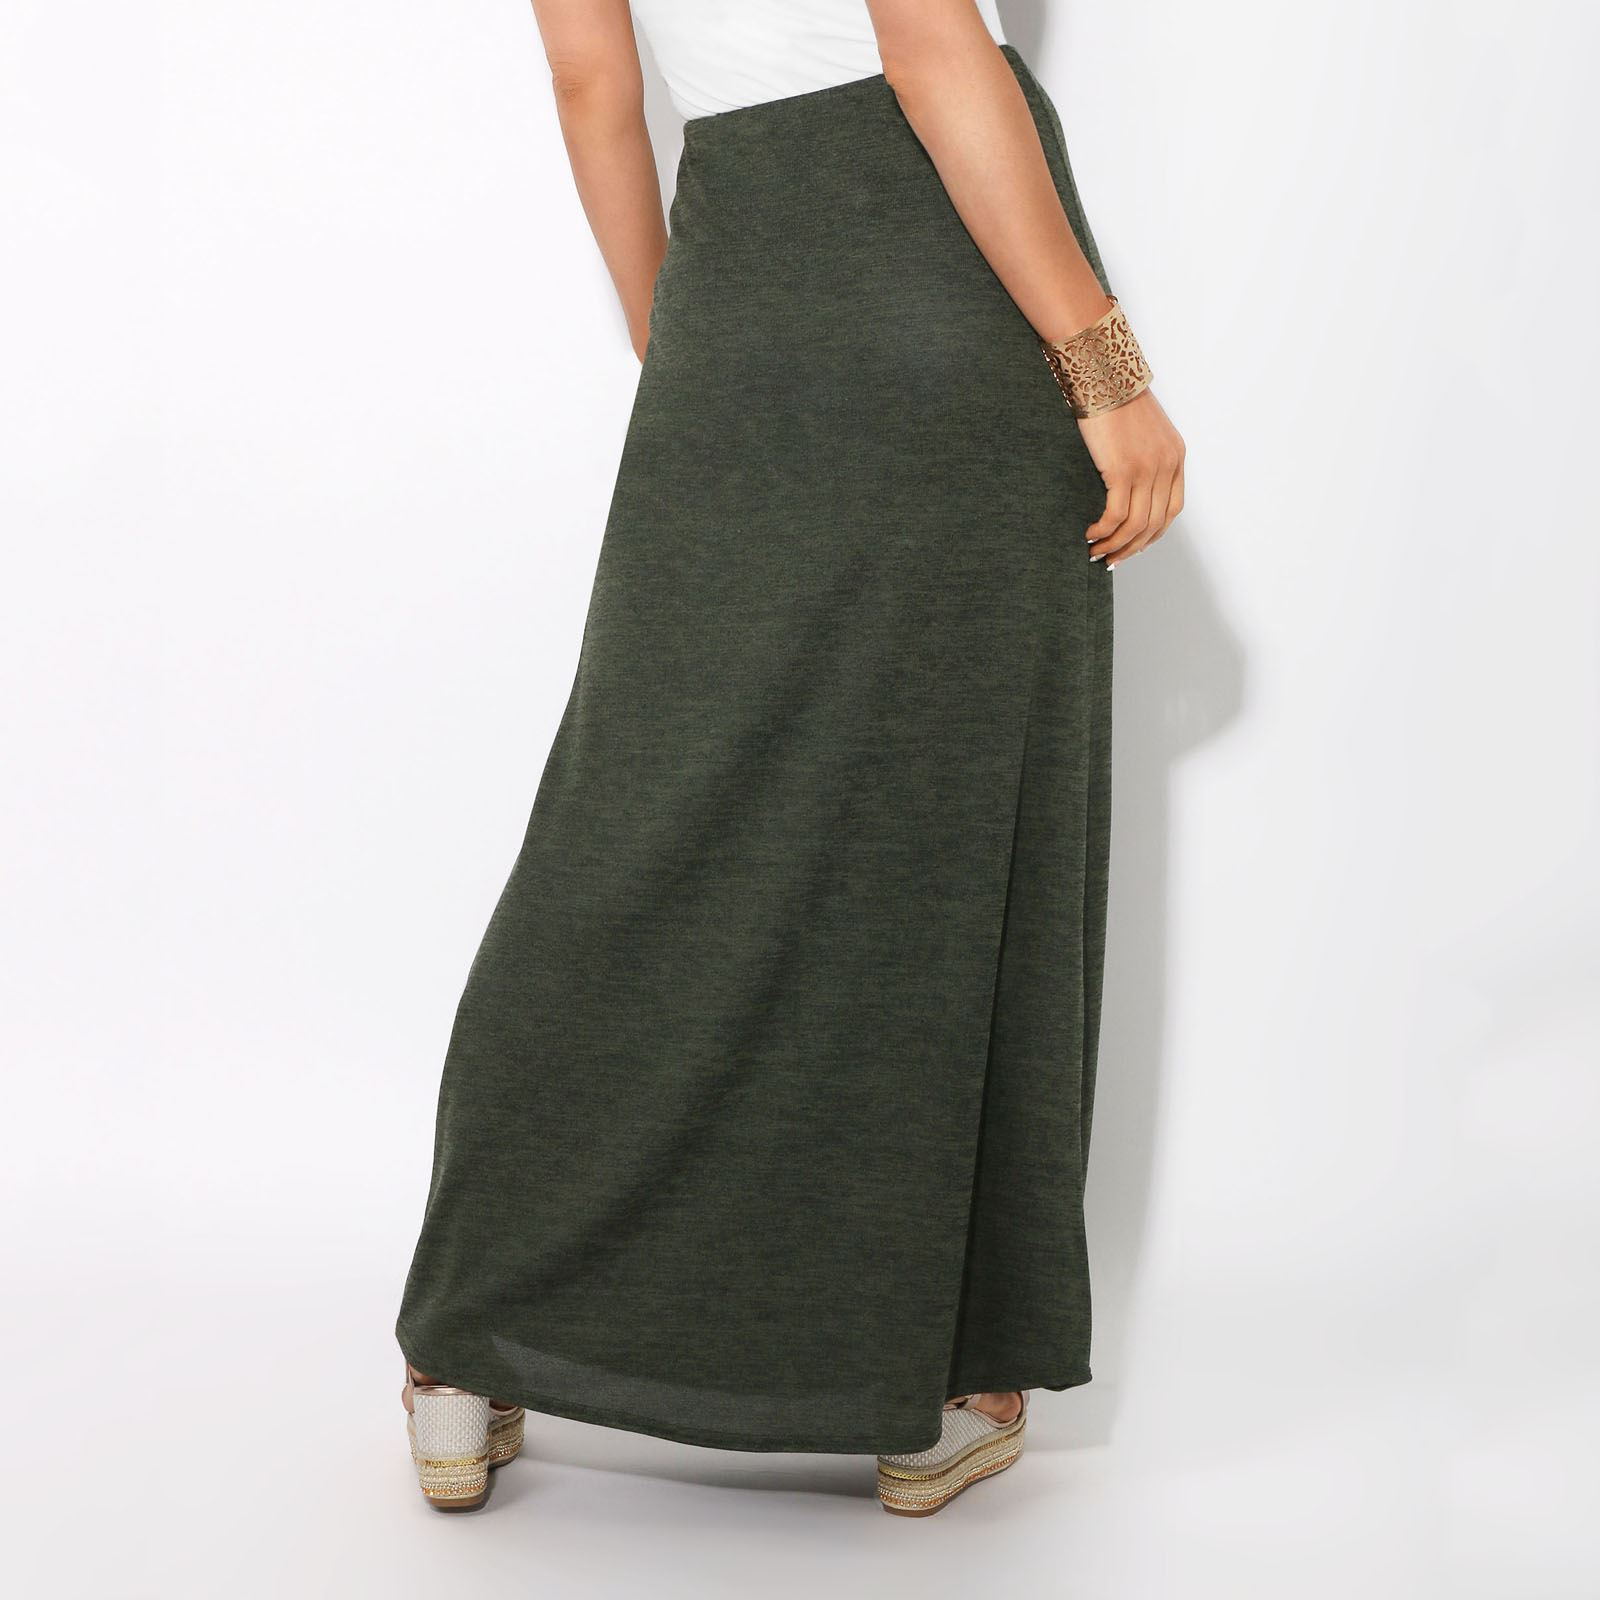 c2ff5a856f Falda Mujer Larga Ajustada Cintura Alta Elástica Elegante Casual ...